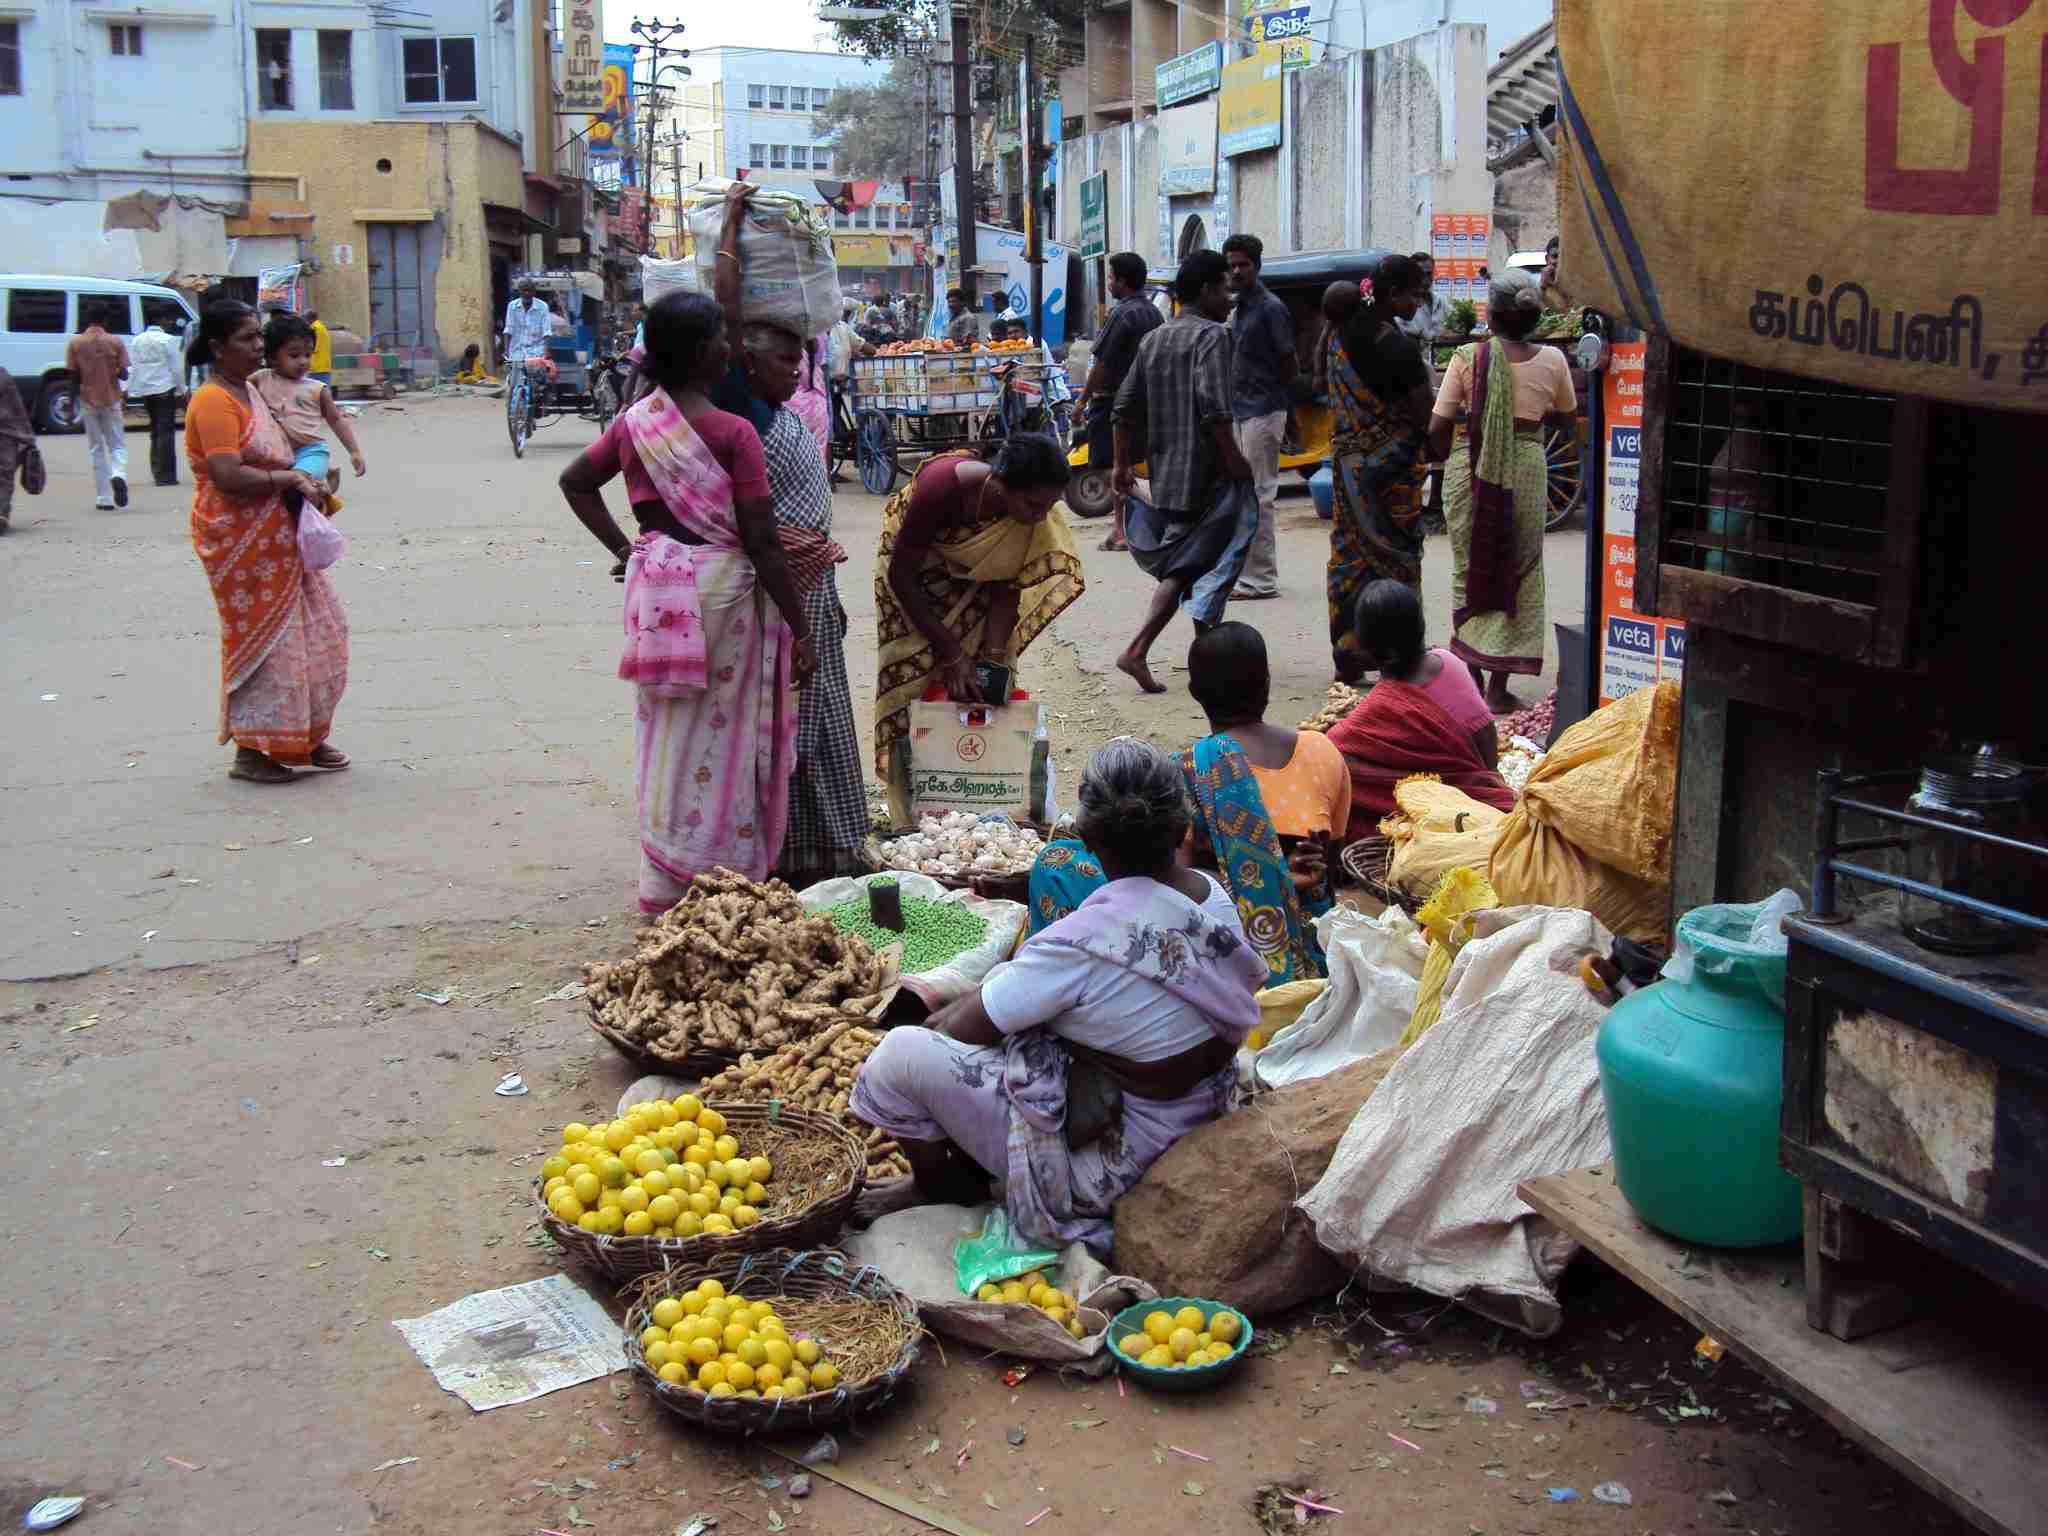 street scenes in Madurai 2